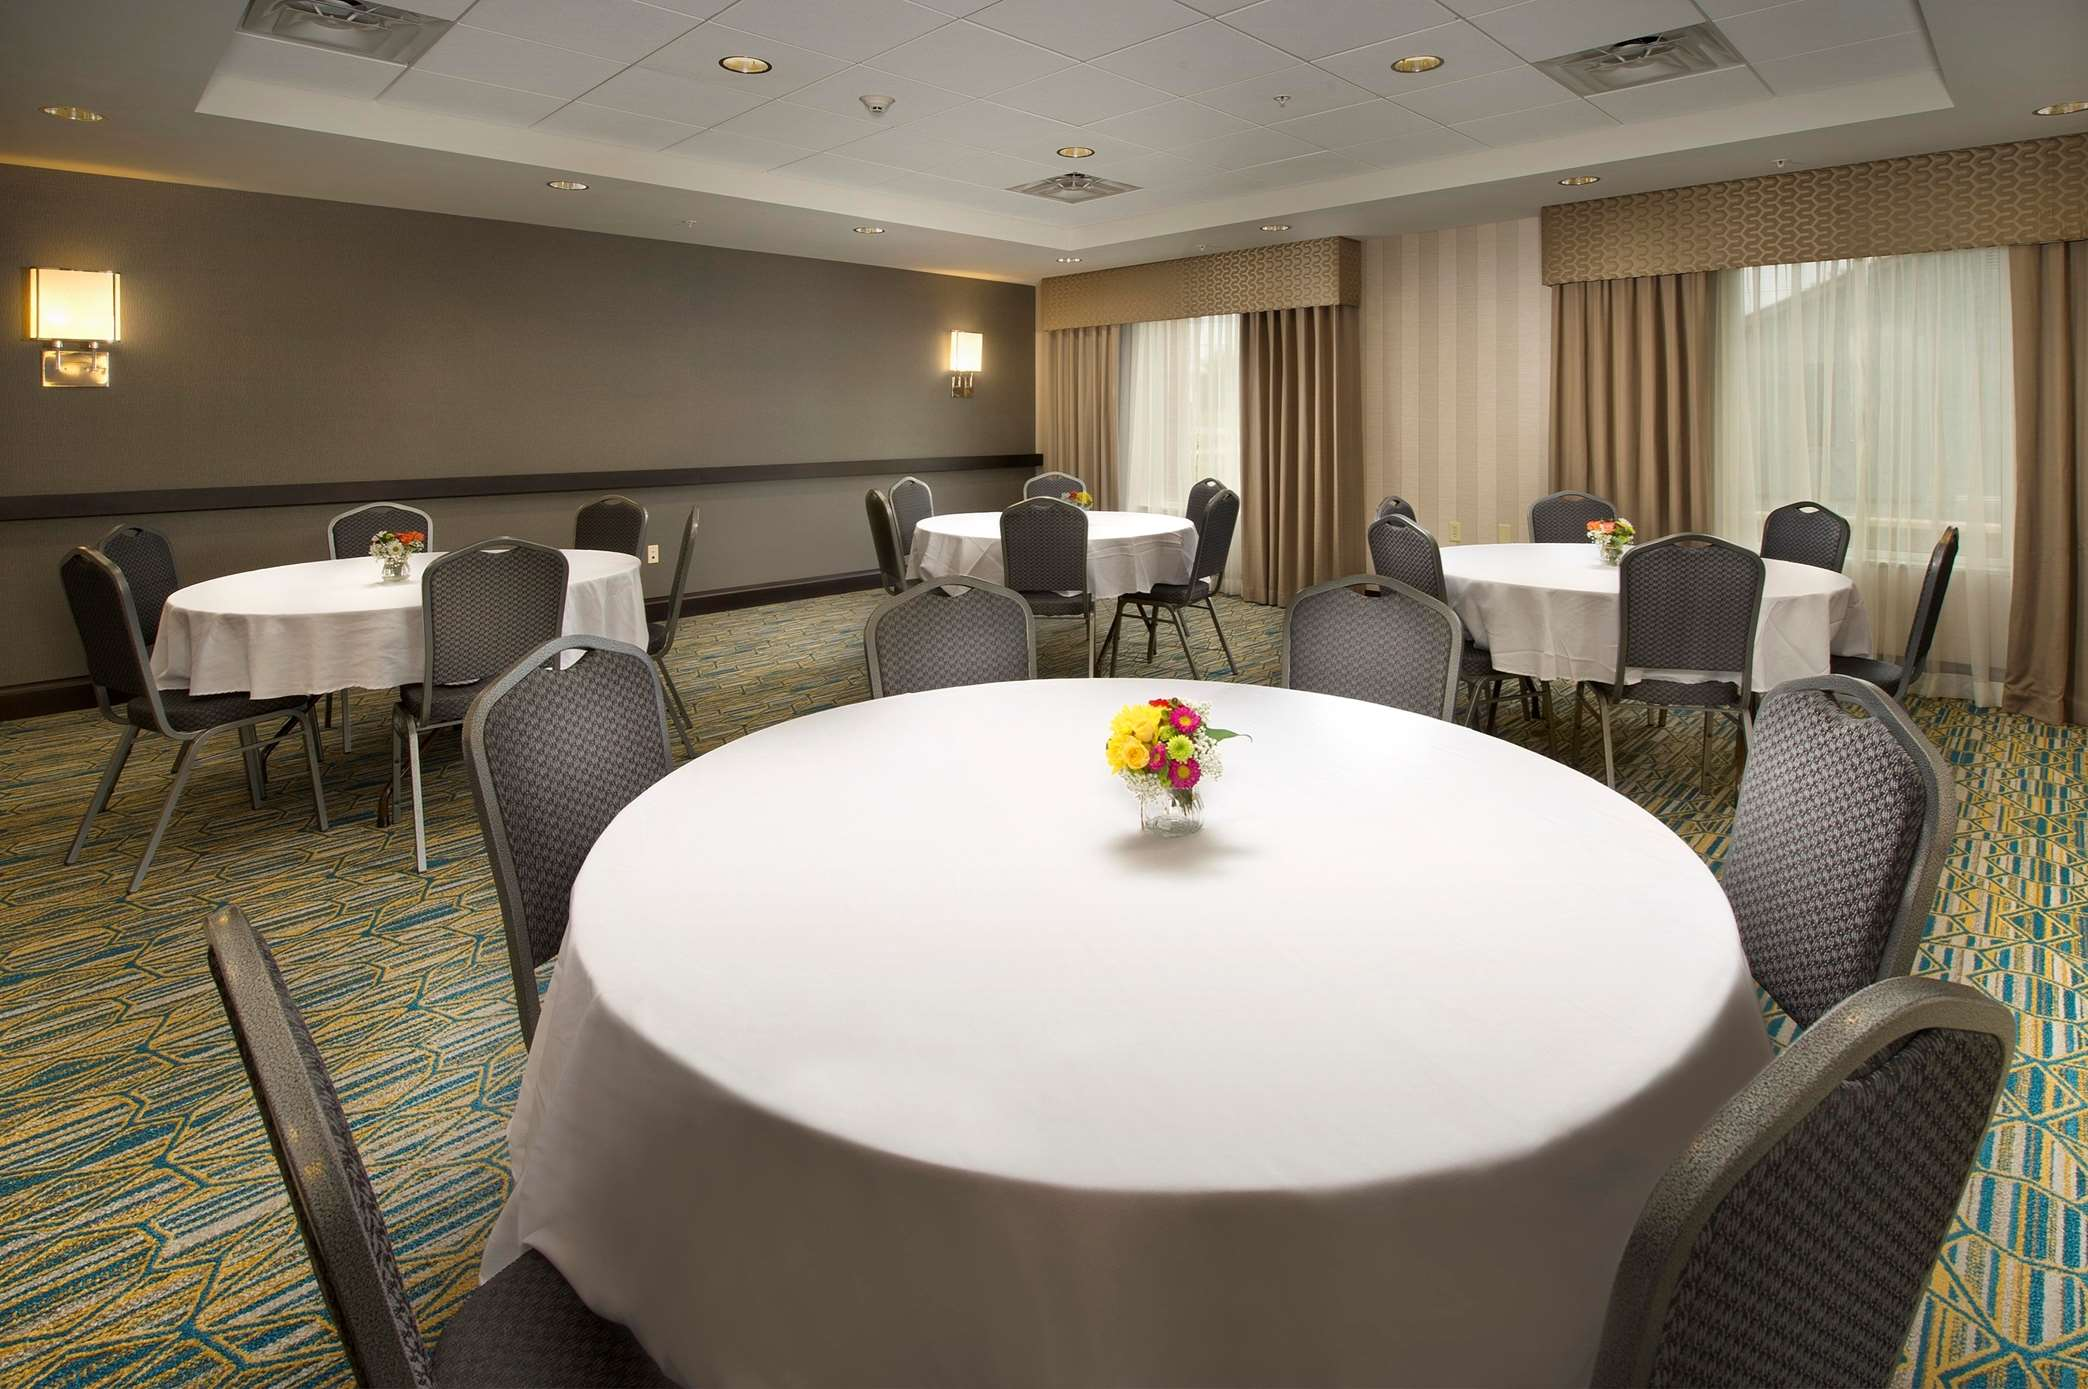 Hampton Inn & Suites Syracuse/Carrier Circle image 12